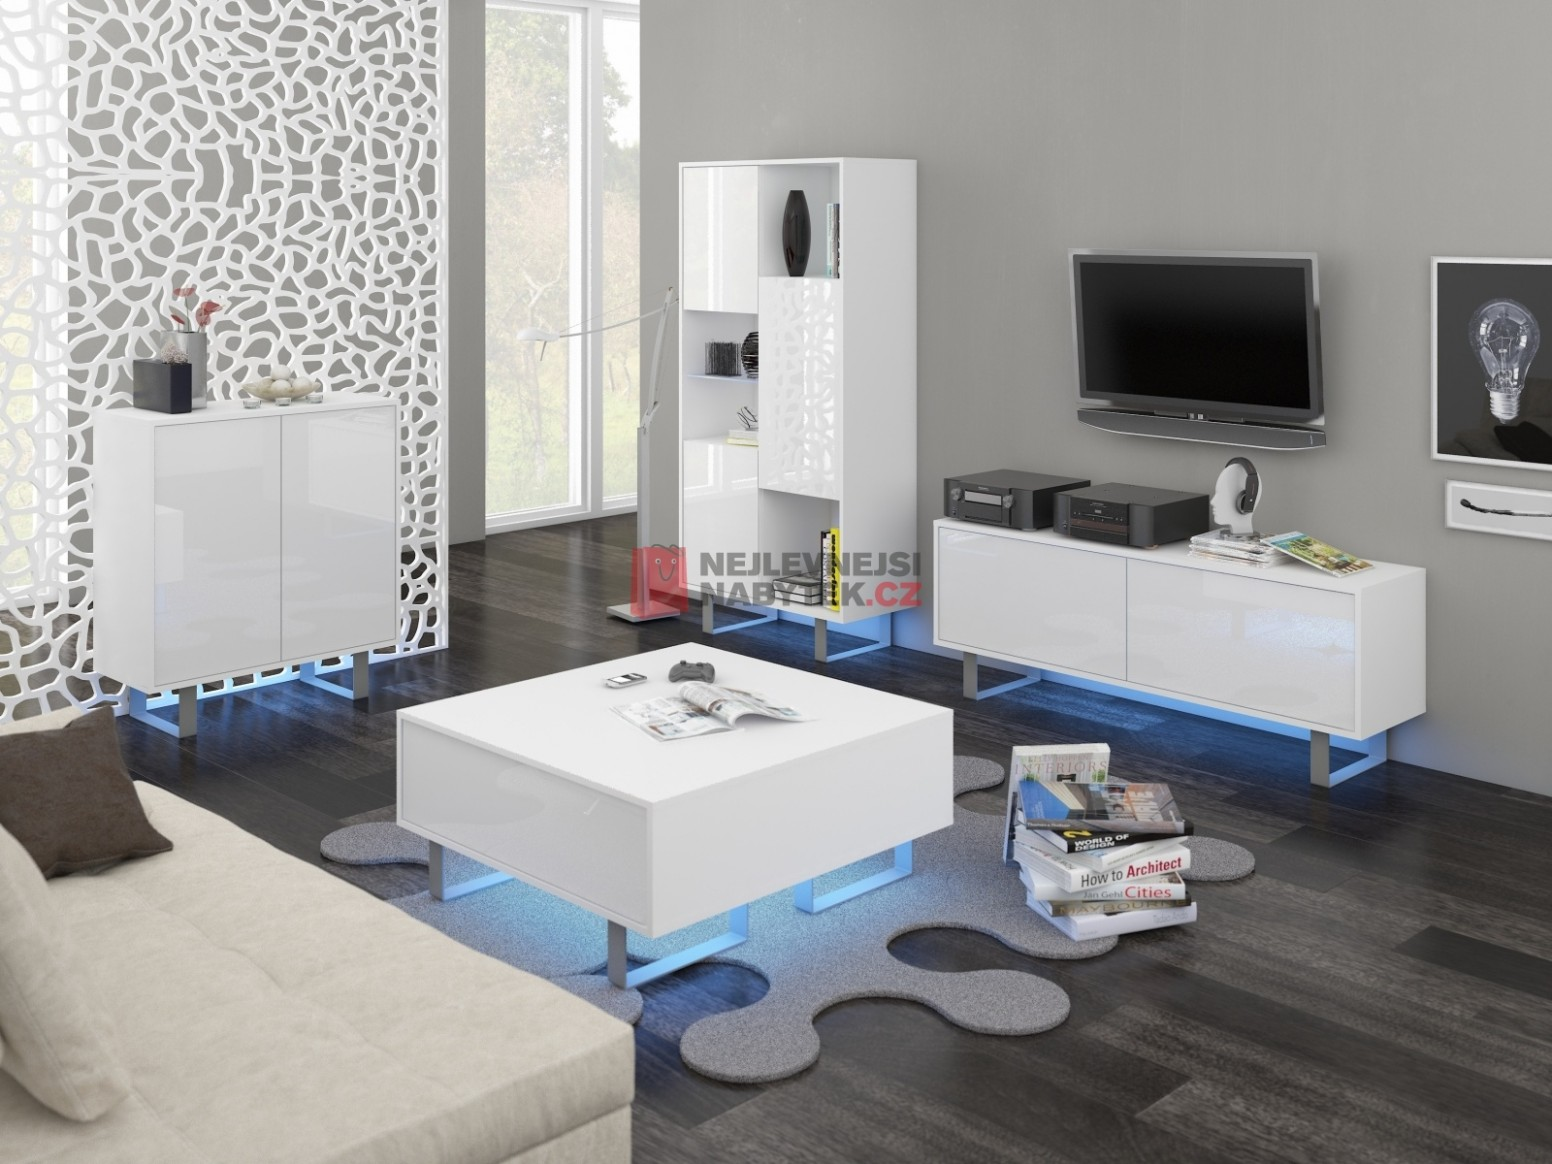 KING obývací pokoj - sestava 1, bílá/bílý leskHEADER_TITLE ...